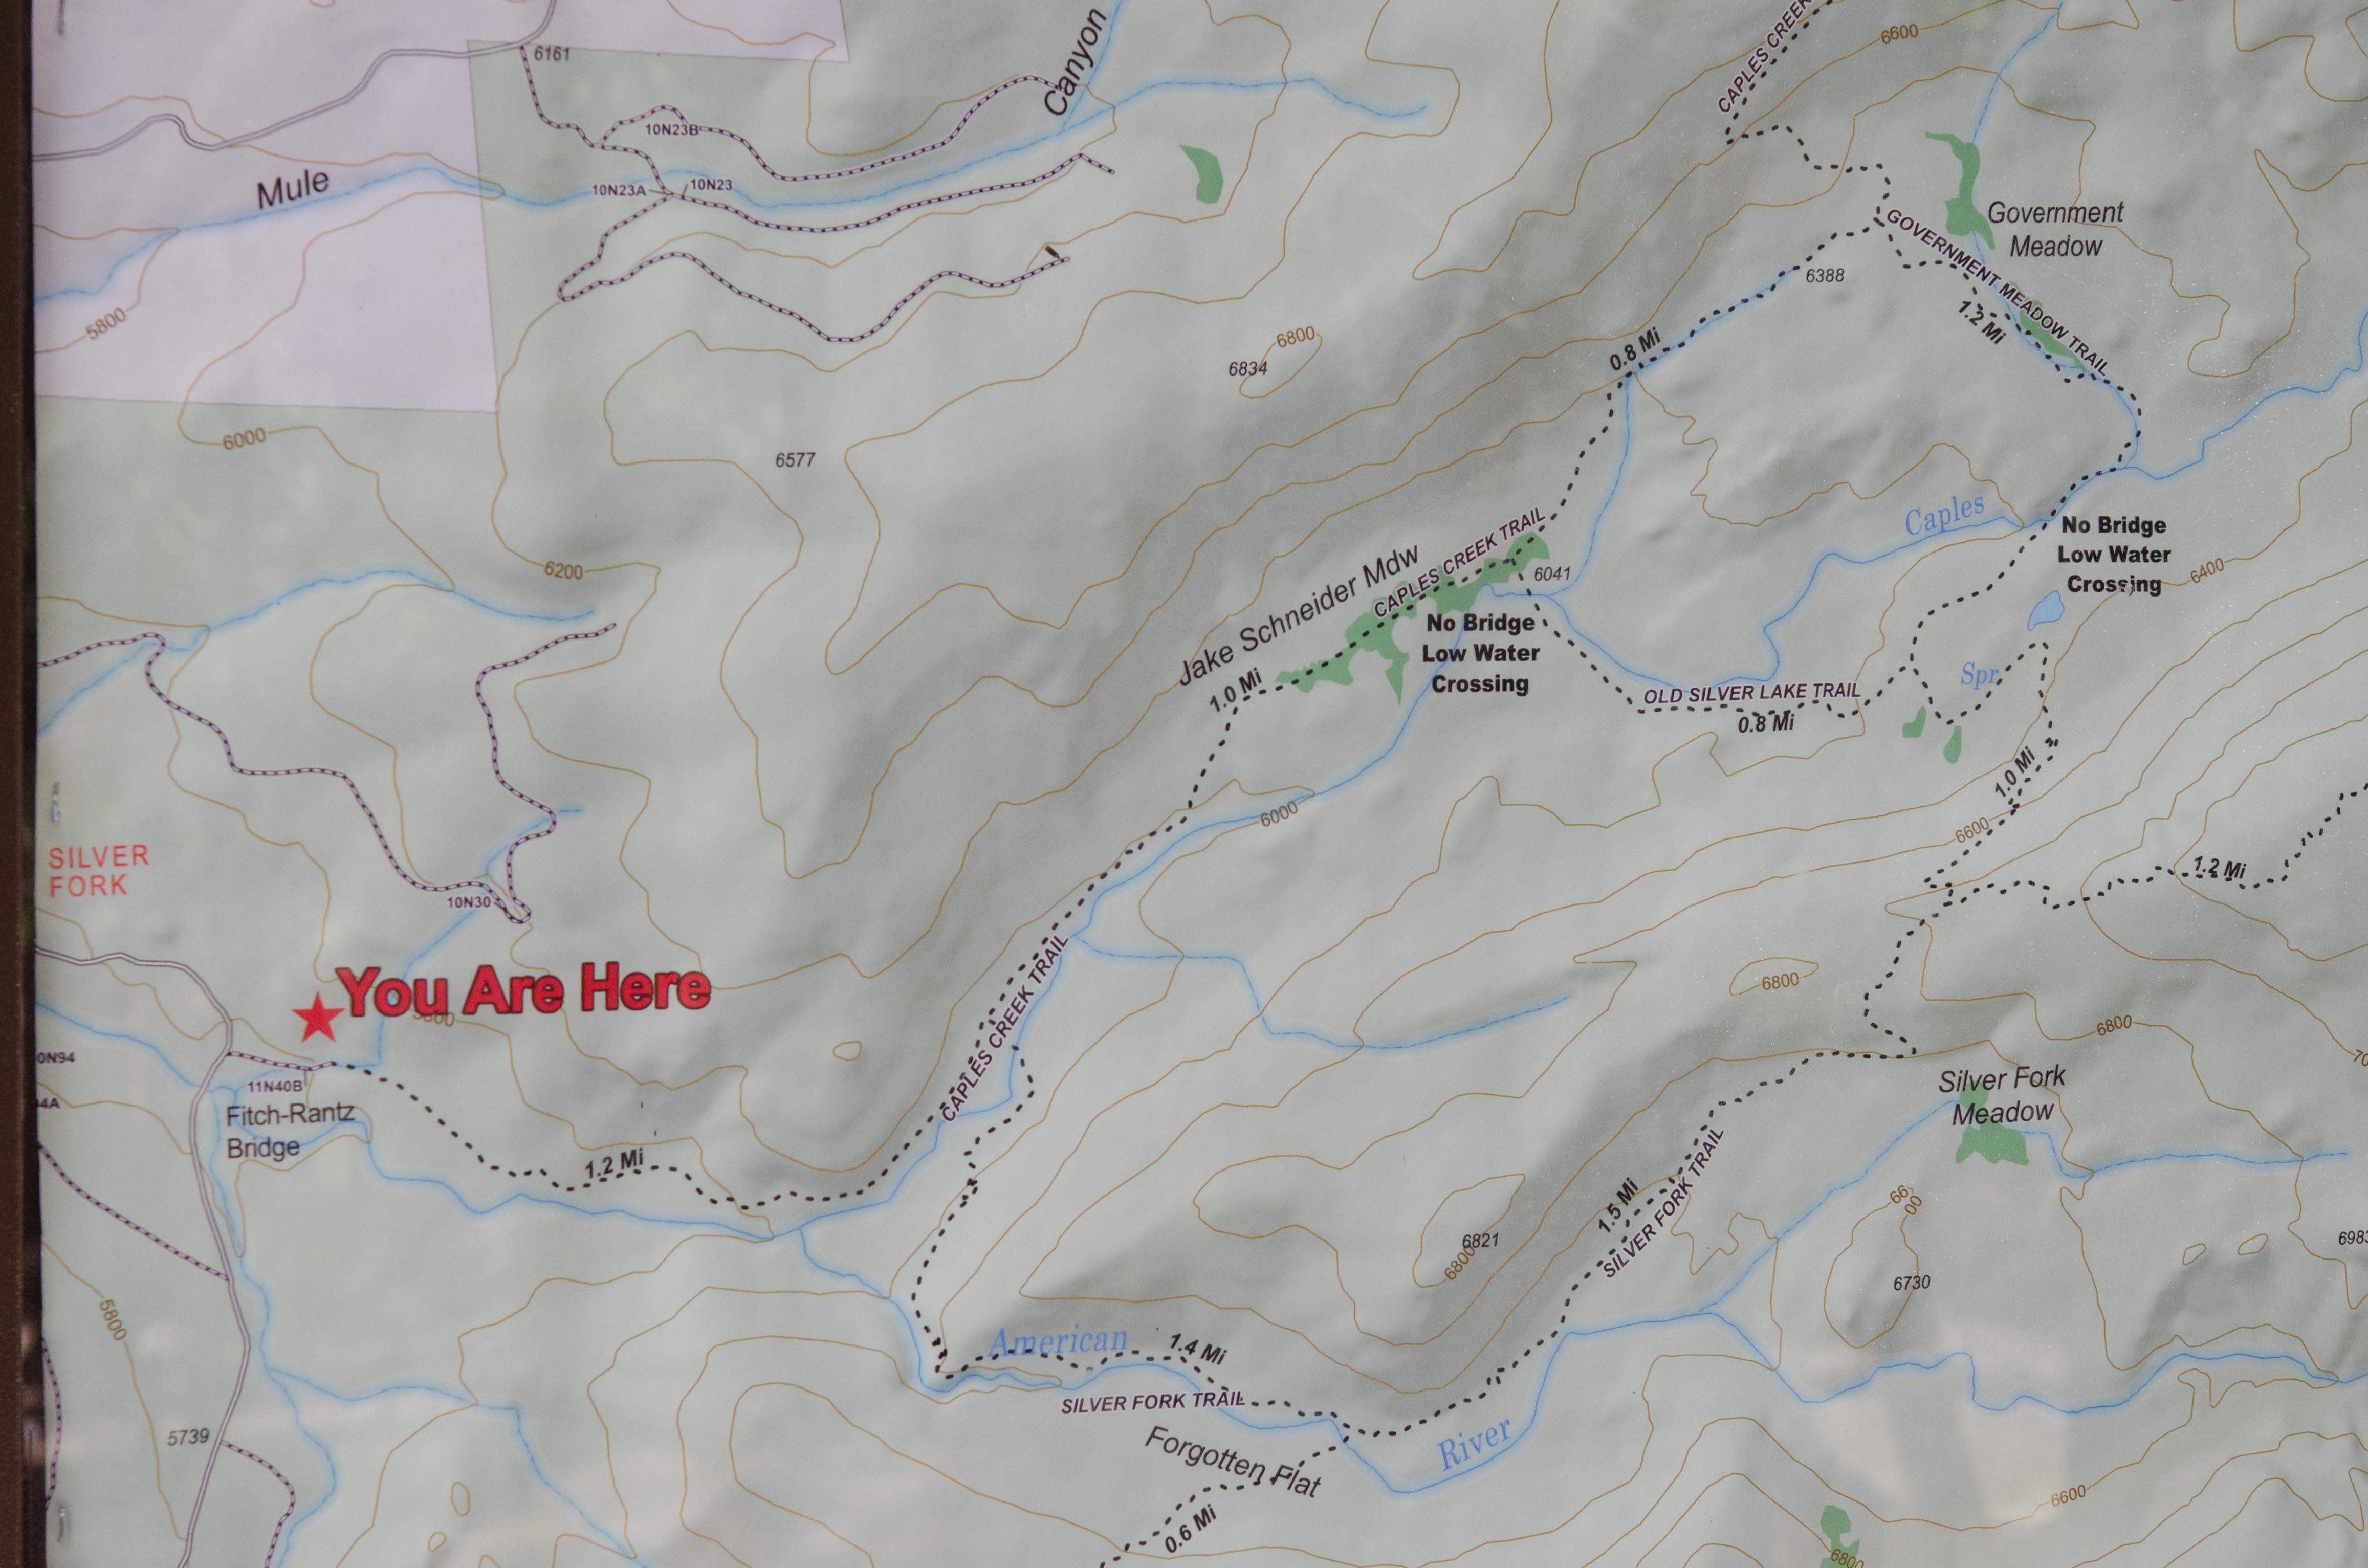 Caples Creek trail map